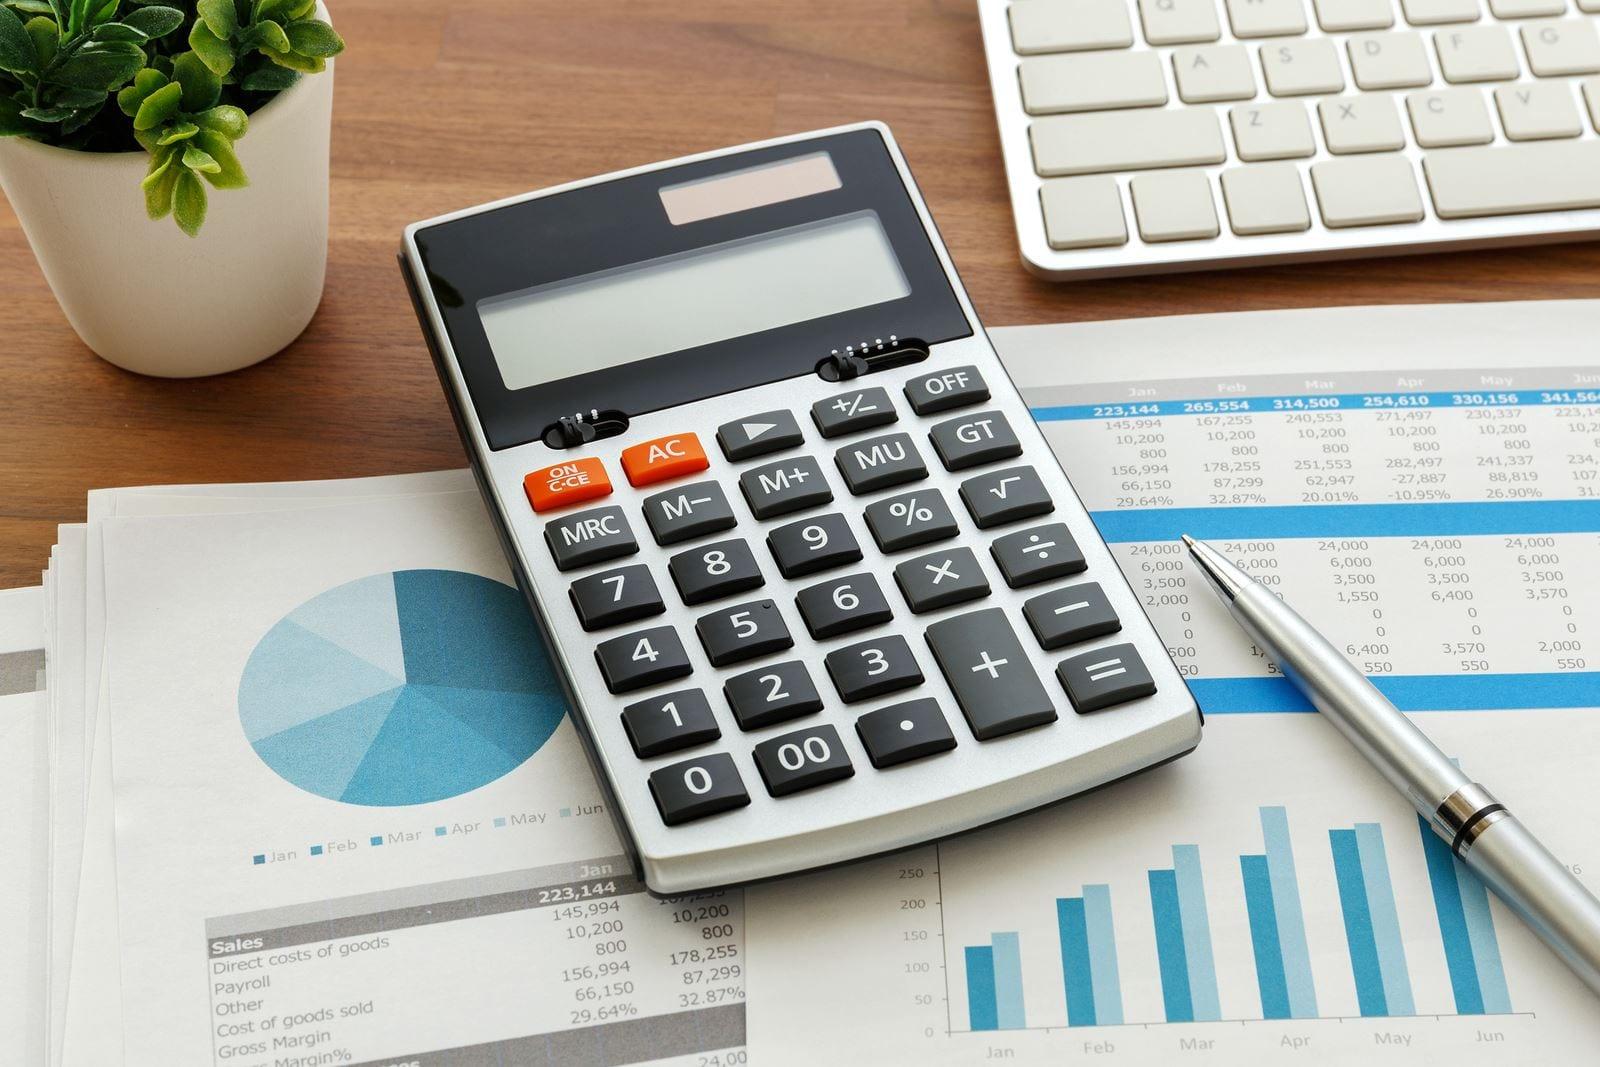 bigstock-Financial-Accounting-With-Calc-219341350.jpg (1600×1067)